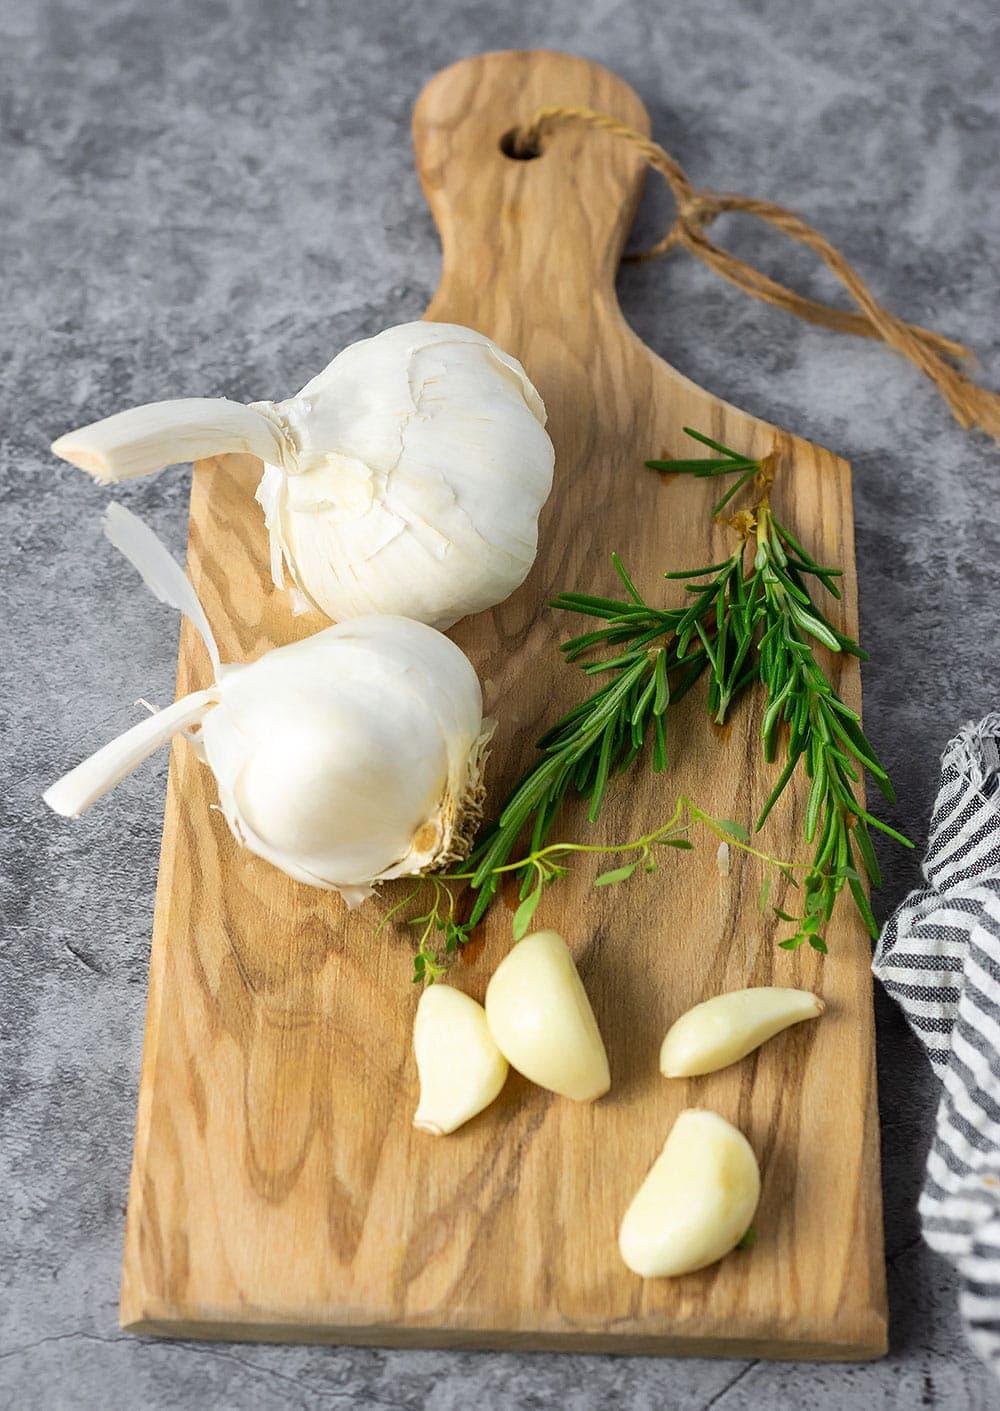 Garlic confit ingredients